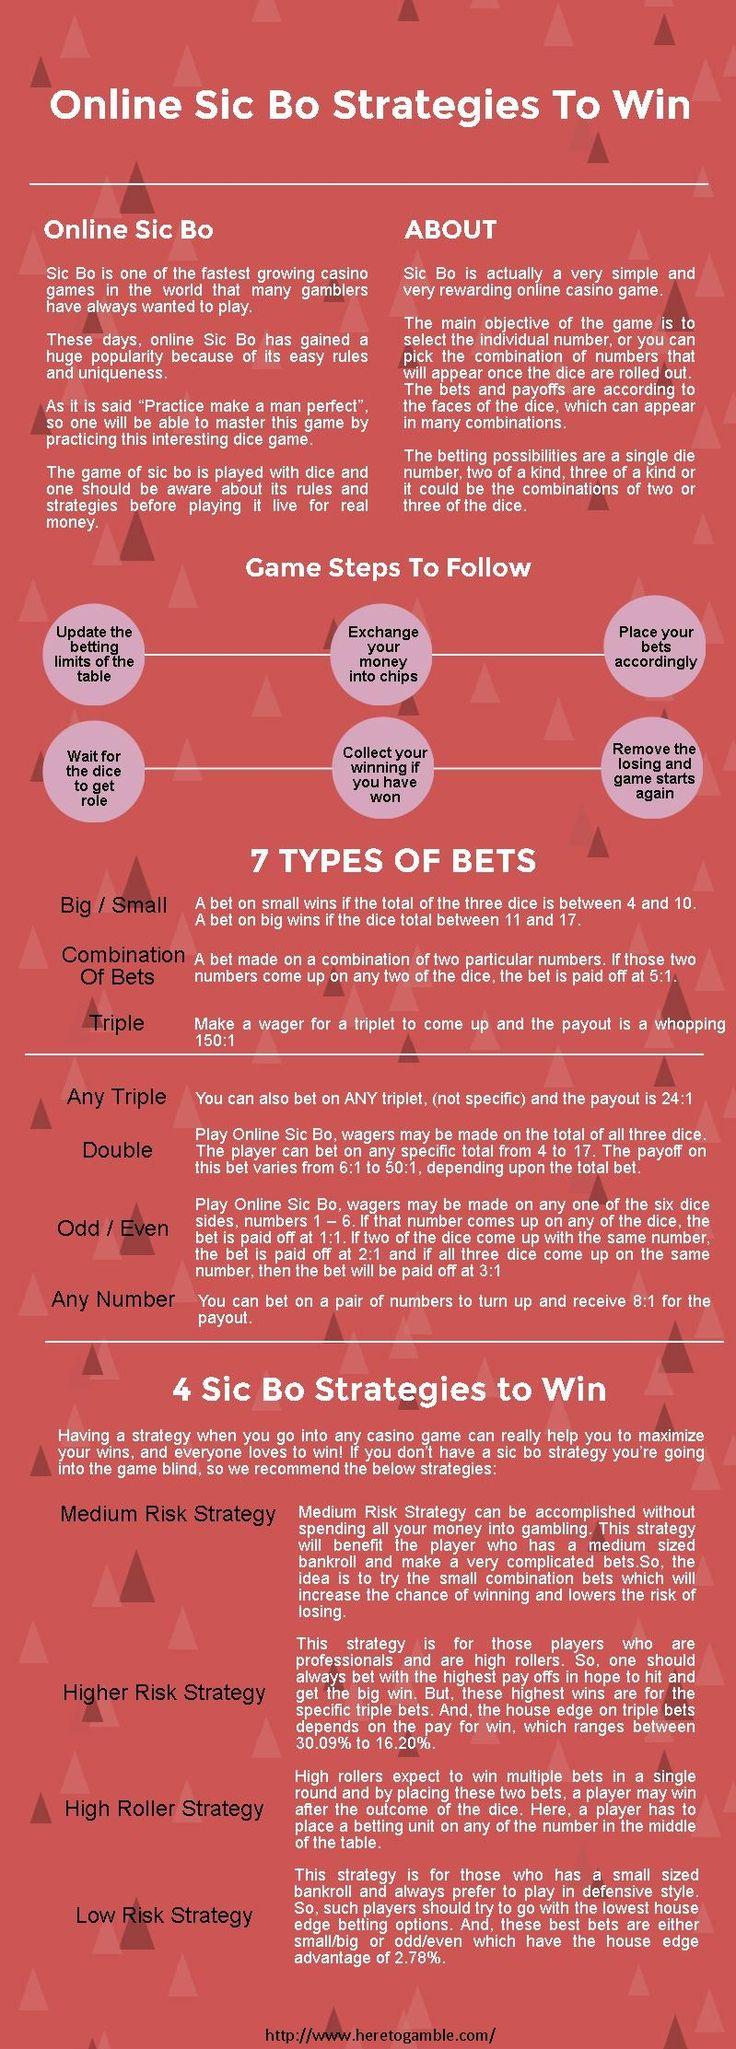 Online Sic Bo Strategies to Win by Heretogamble.com #WinningTips #Tips #gambling #bettingtips #Strategy